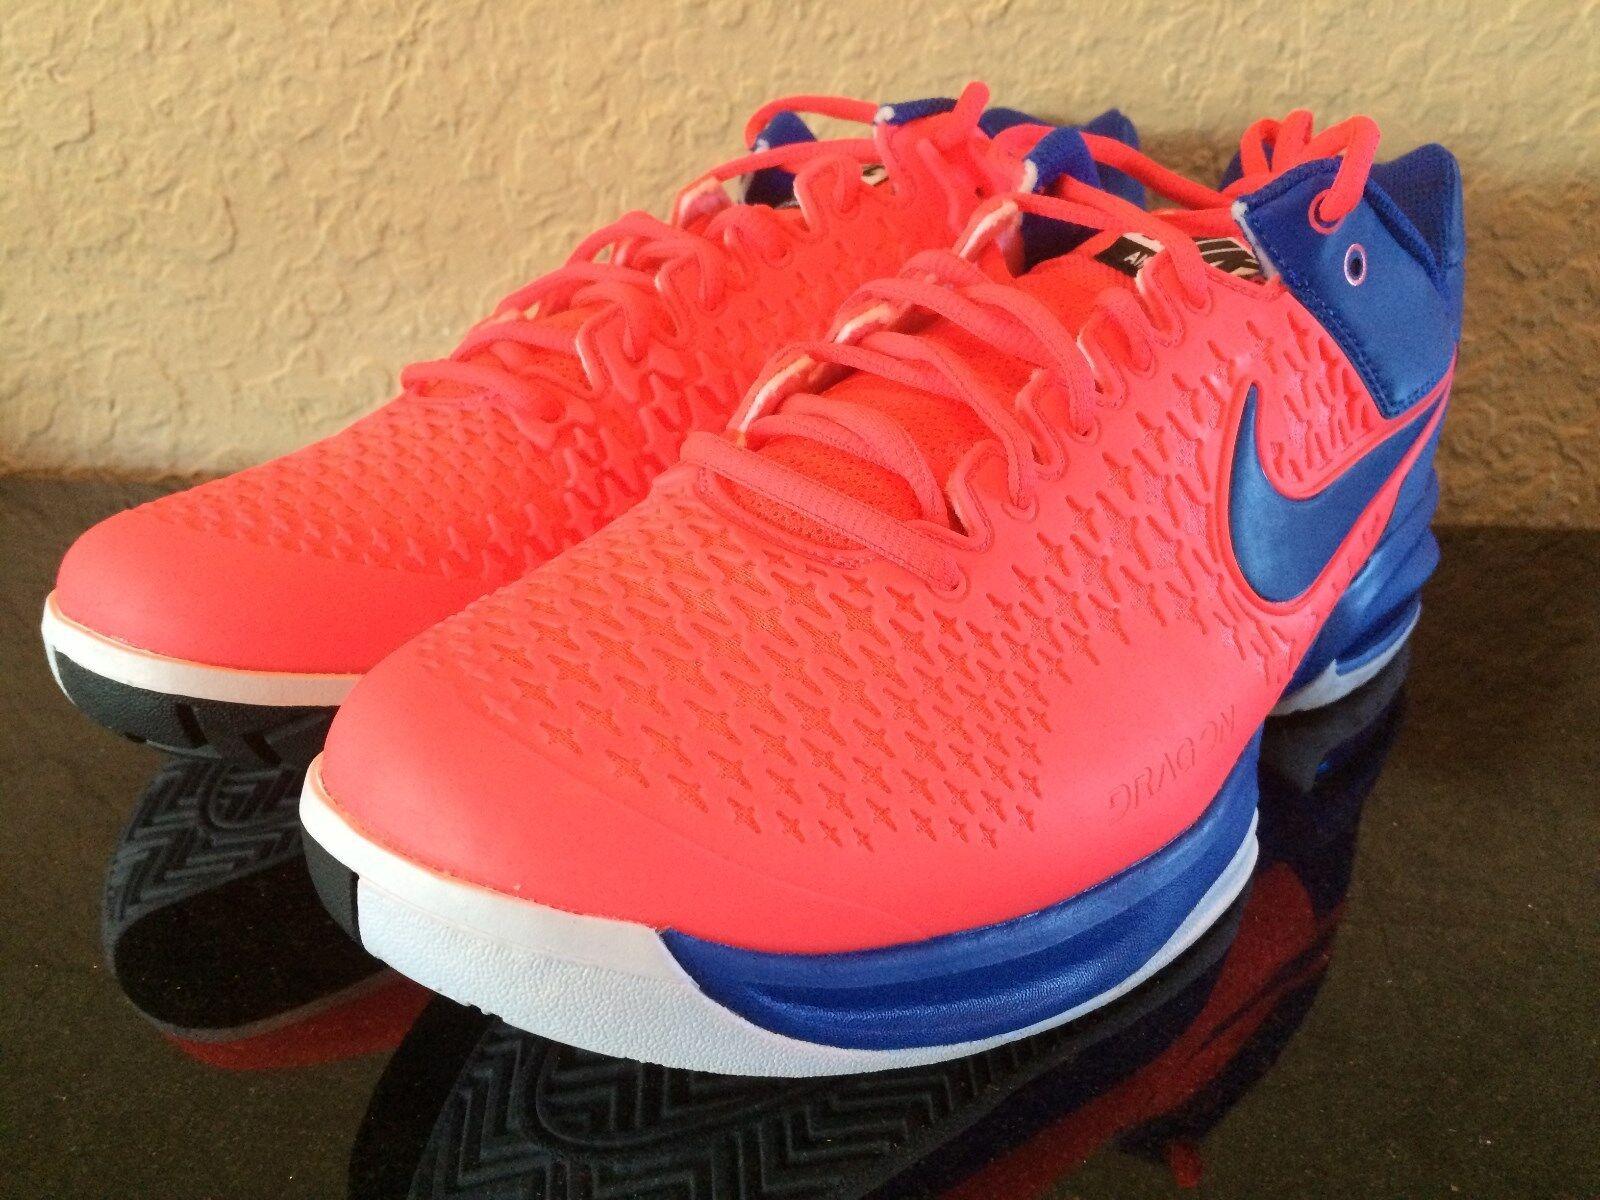 Nike air max cagetennis schuhe roten lava lava lava blaue ny 2014 96f42f